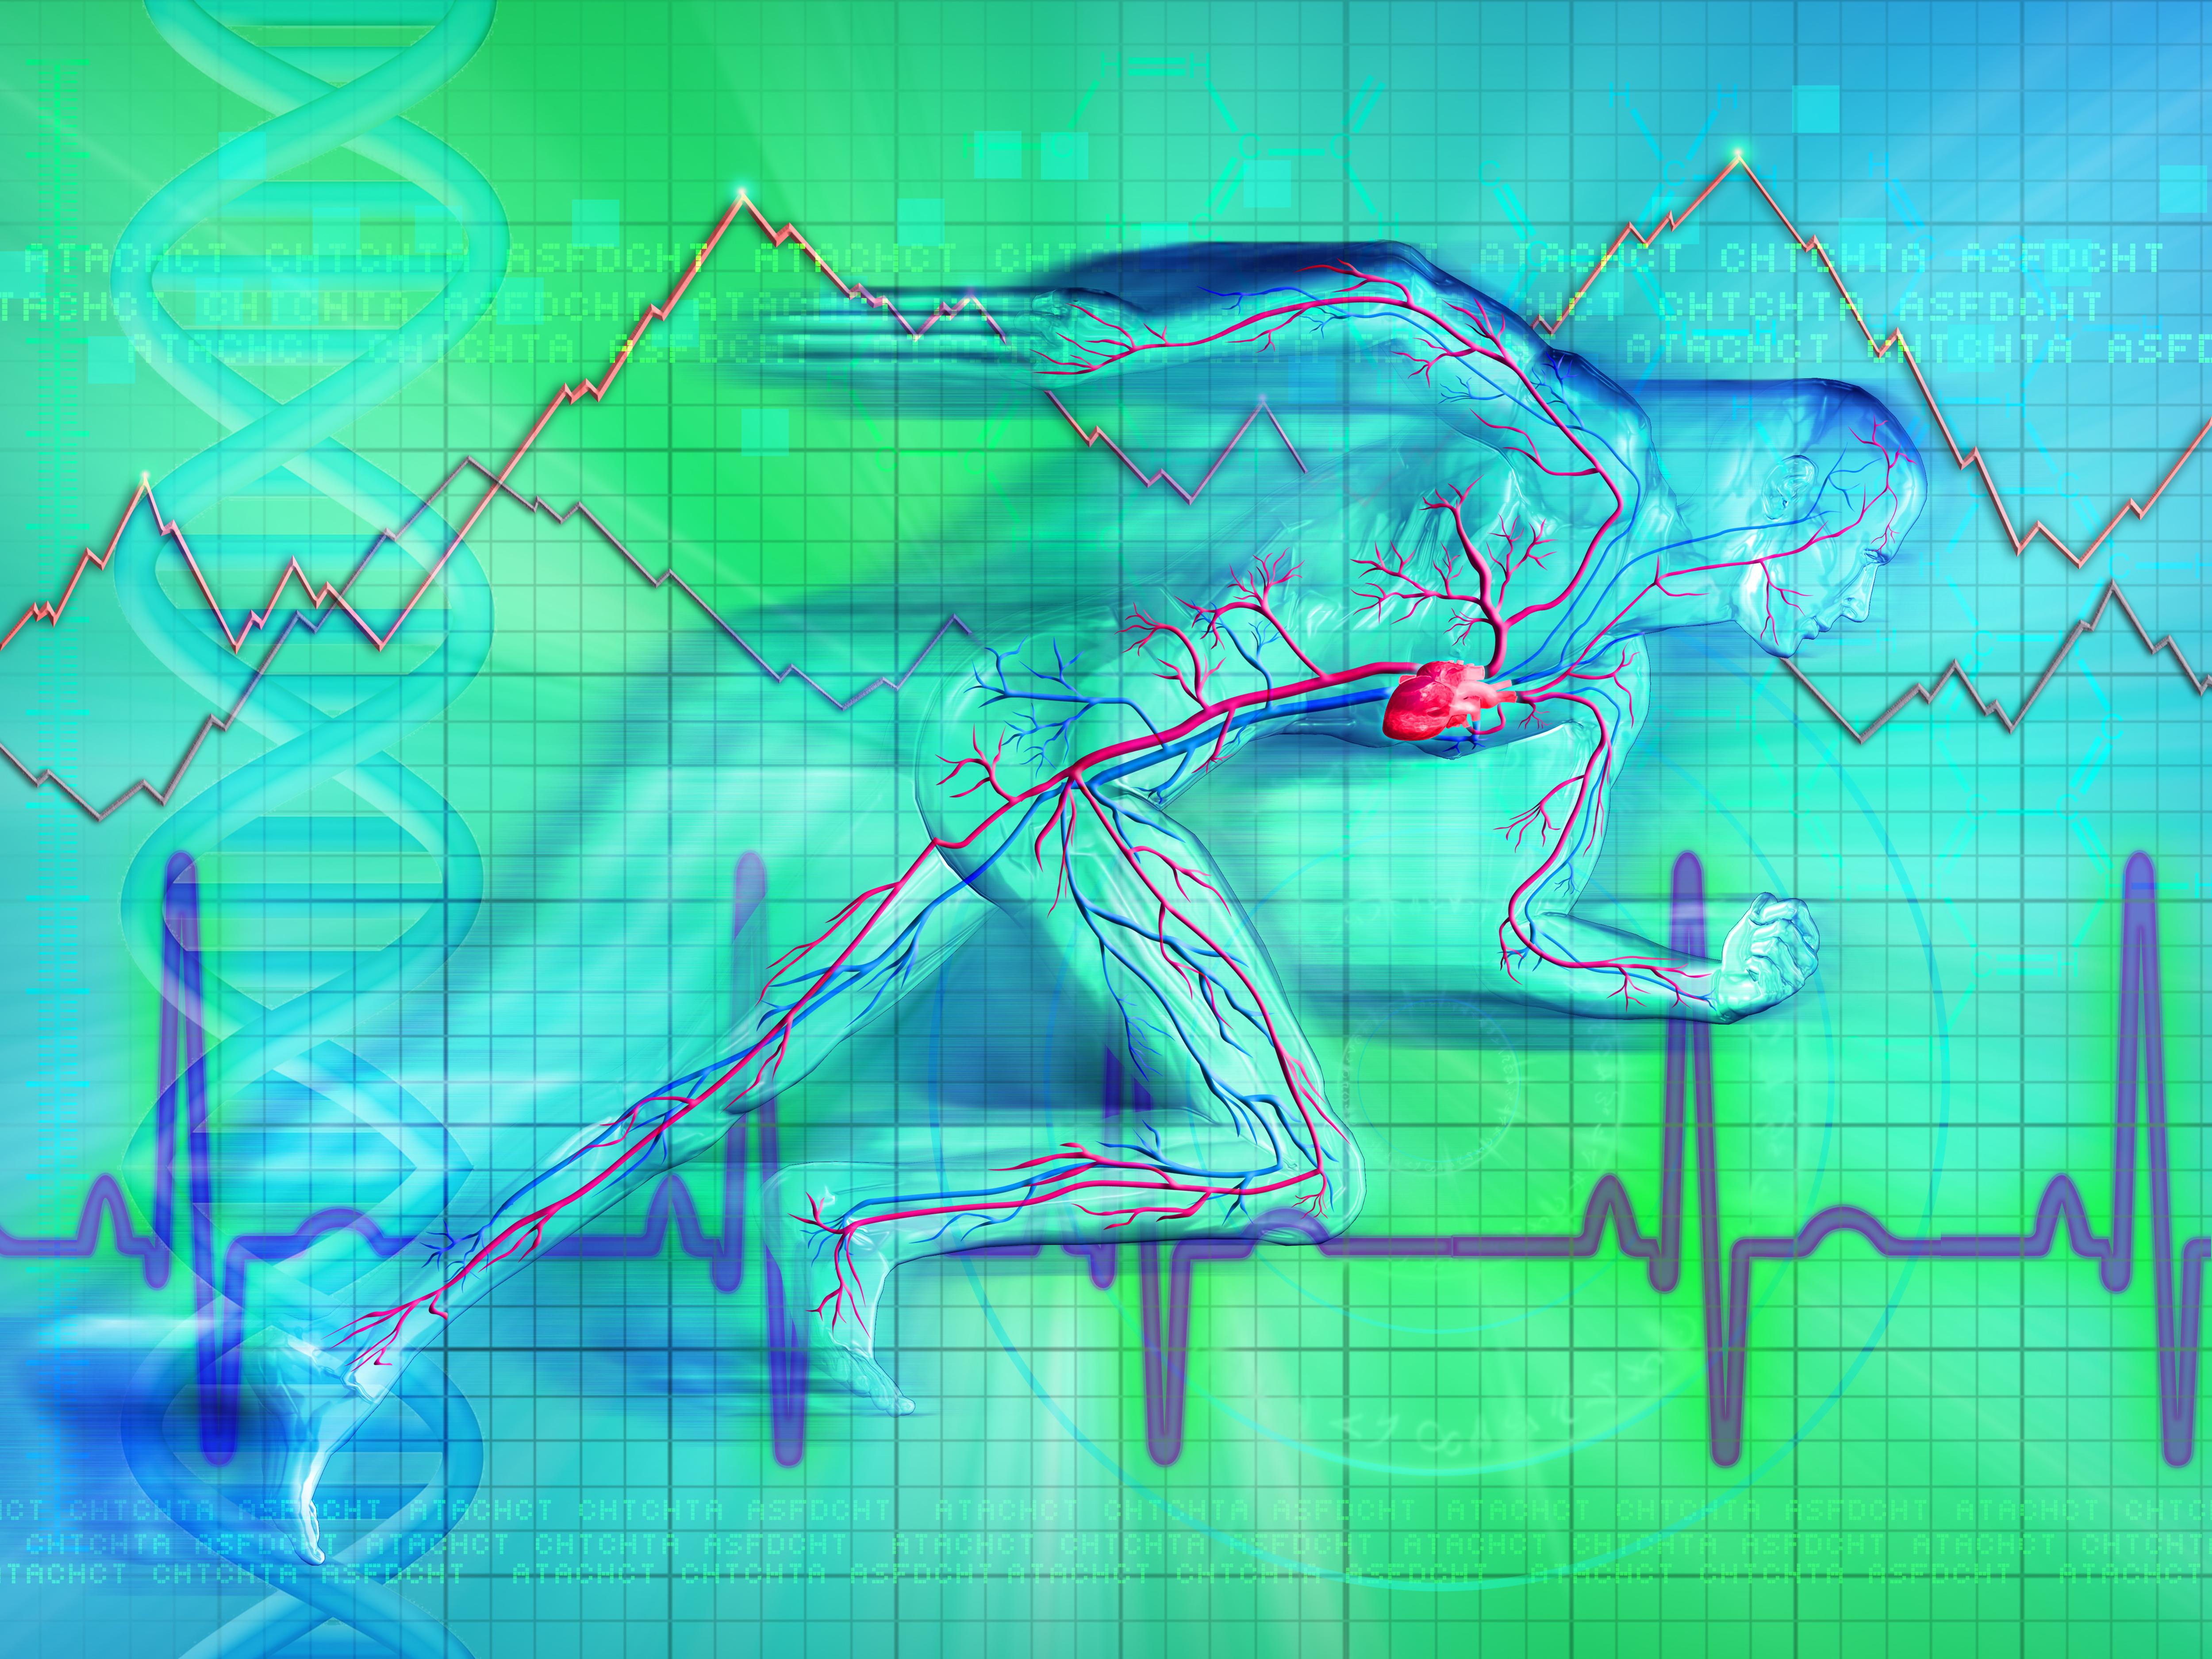 Magas pulzus gyötör? Spéci vizsgálatunk segít - hoppalmihaly.hu